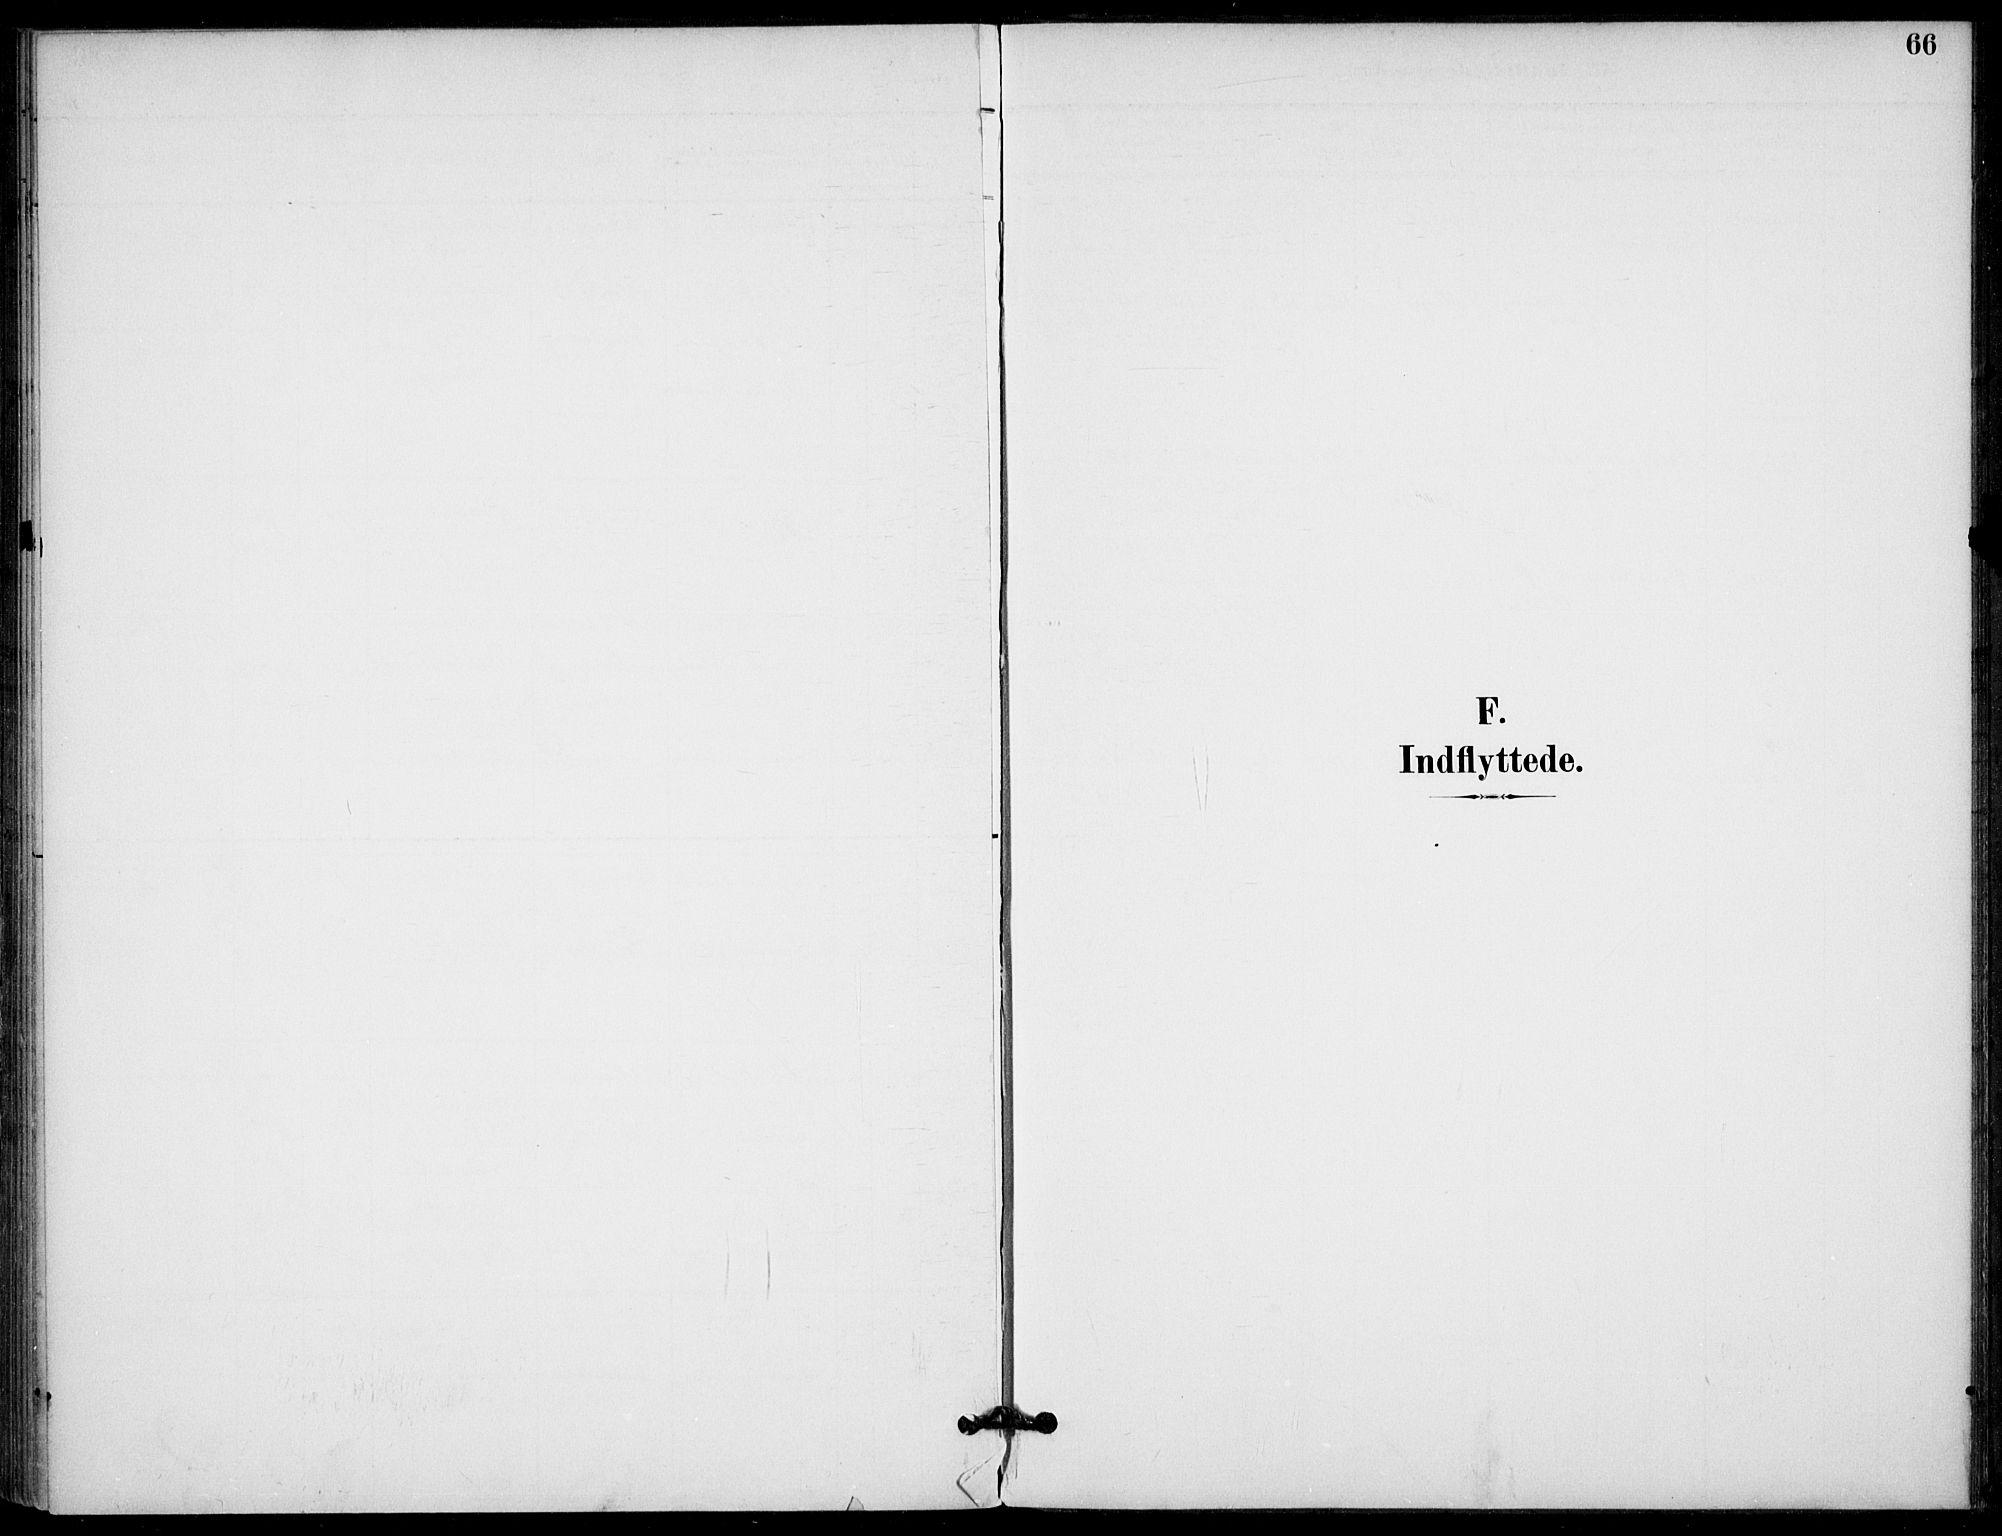 SAKO, Lunde kirkebøker, F/Fb/L0004: Ministerialbok nr. II 4, 1892-1907, s. 66